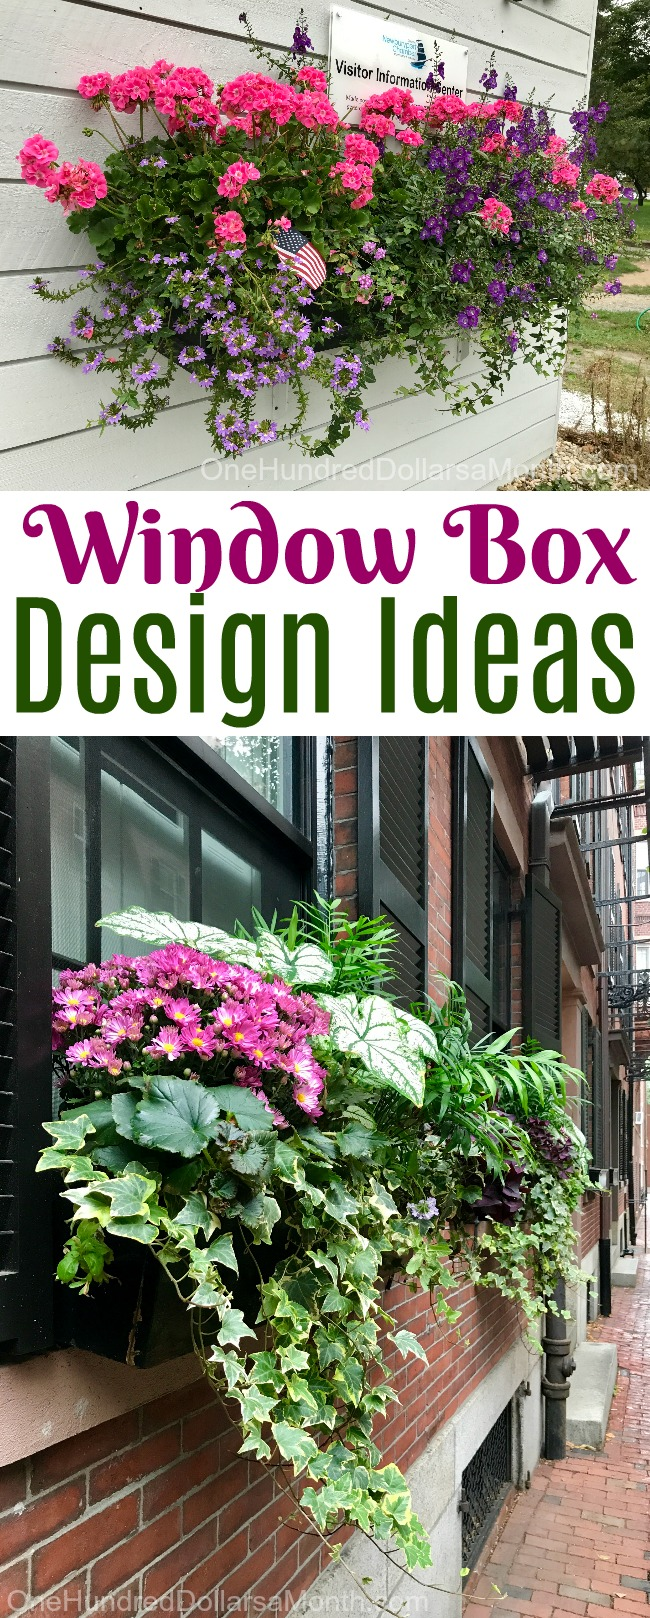 Beautiful Window Box Design Ideas from the Northeast